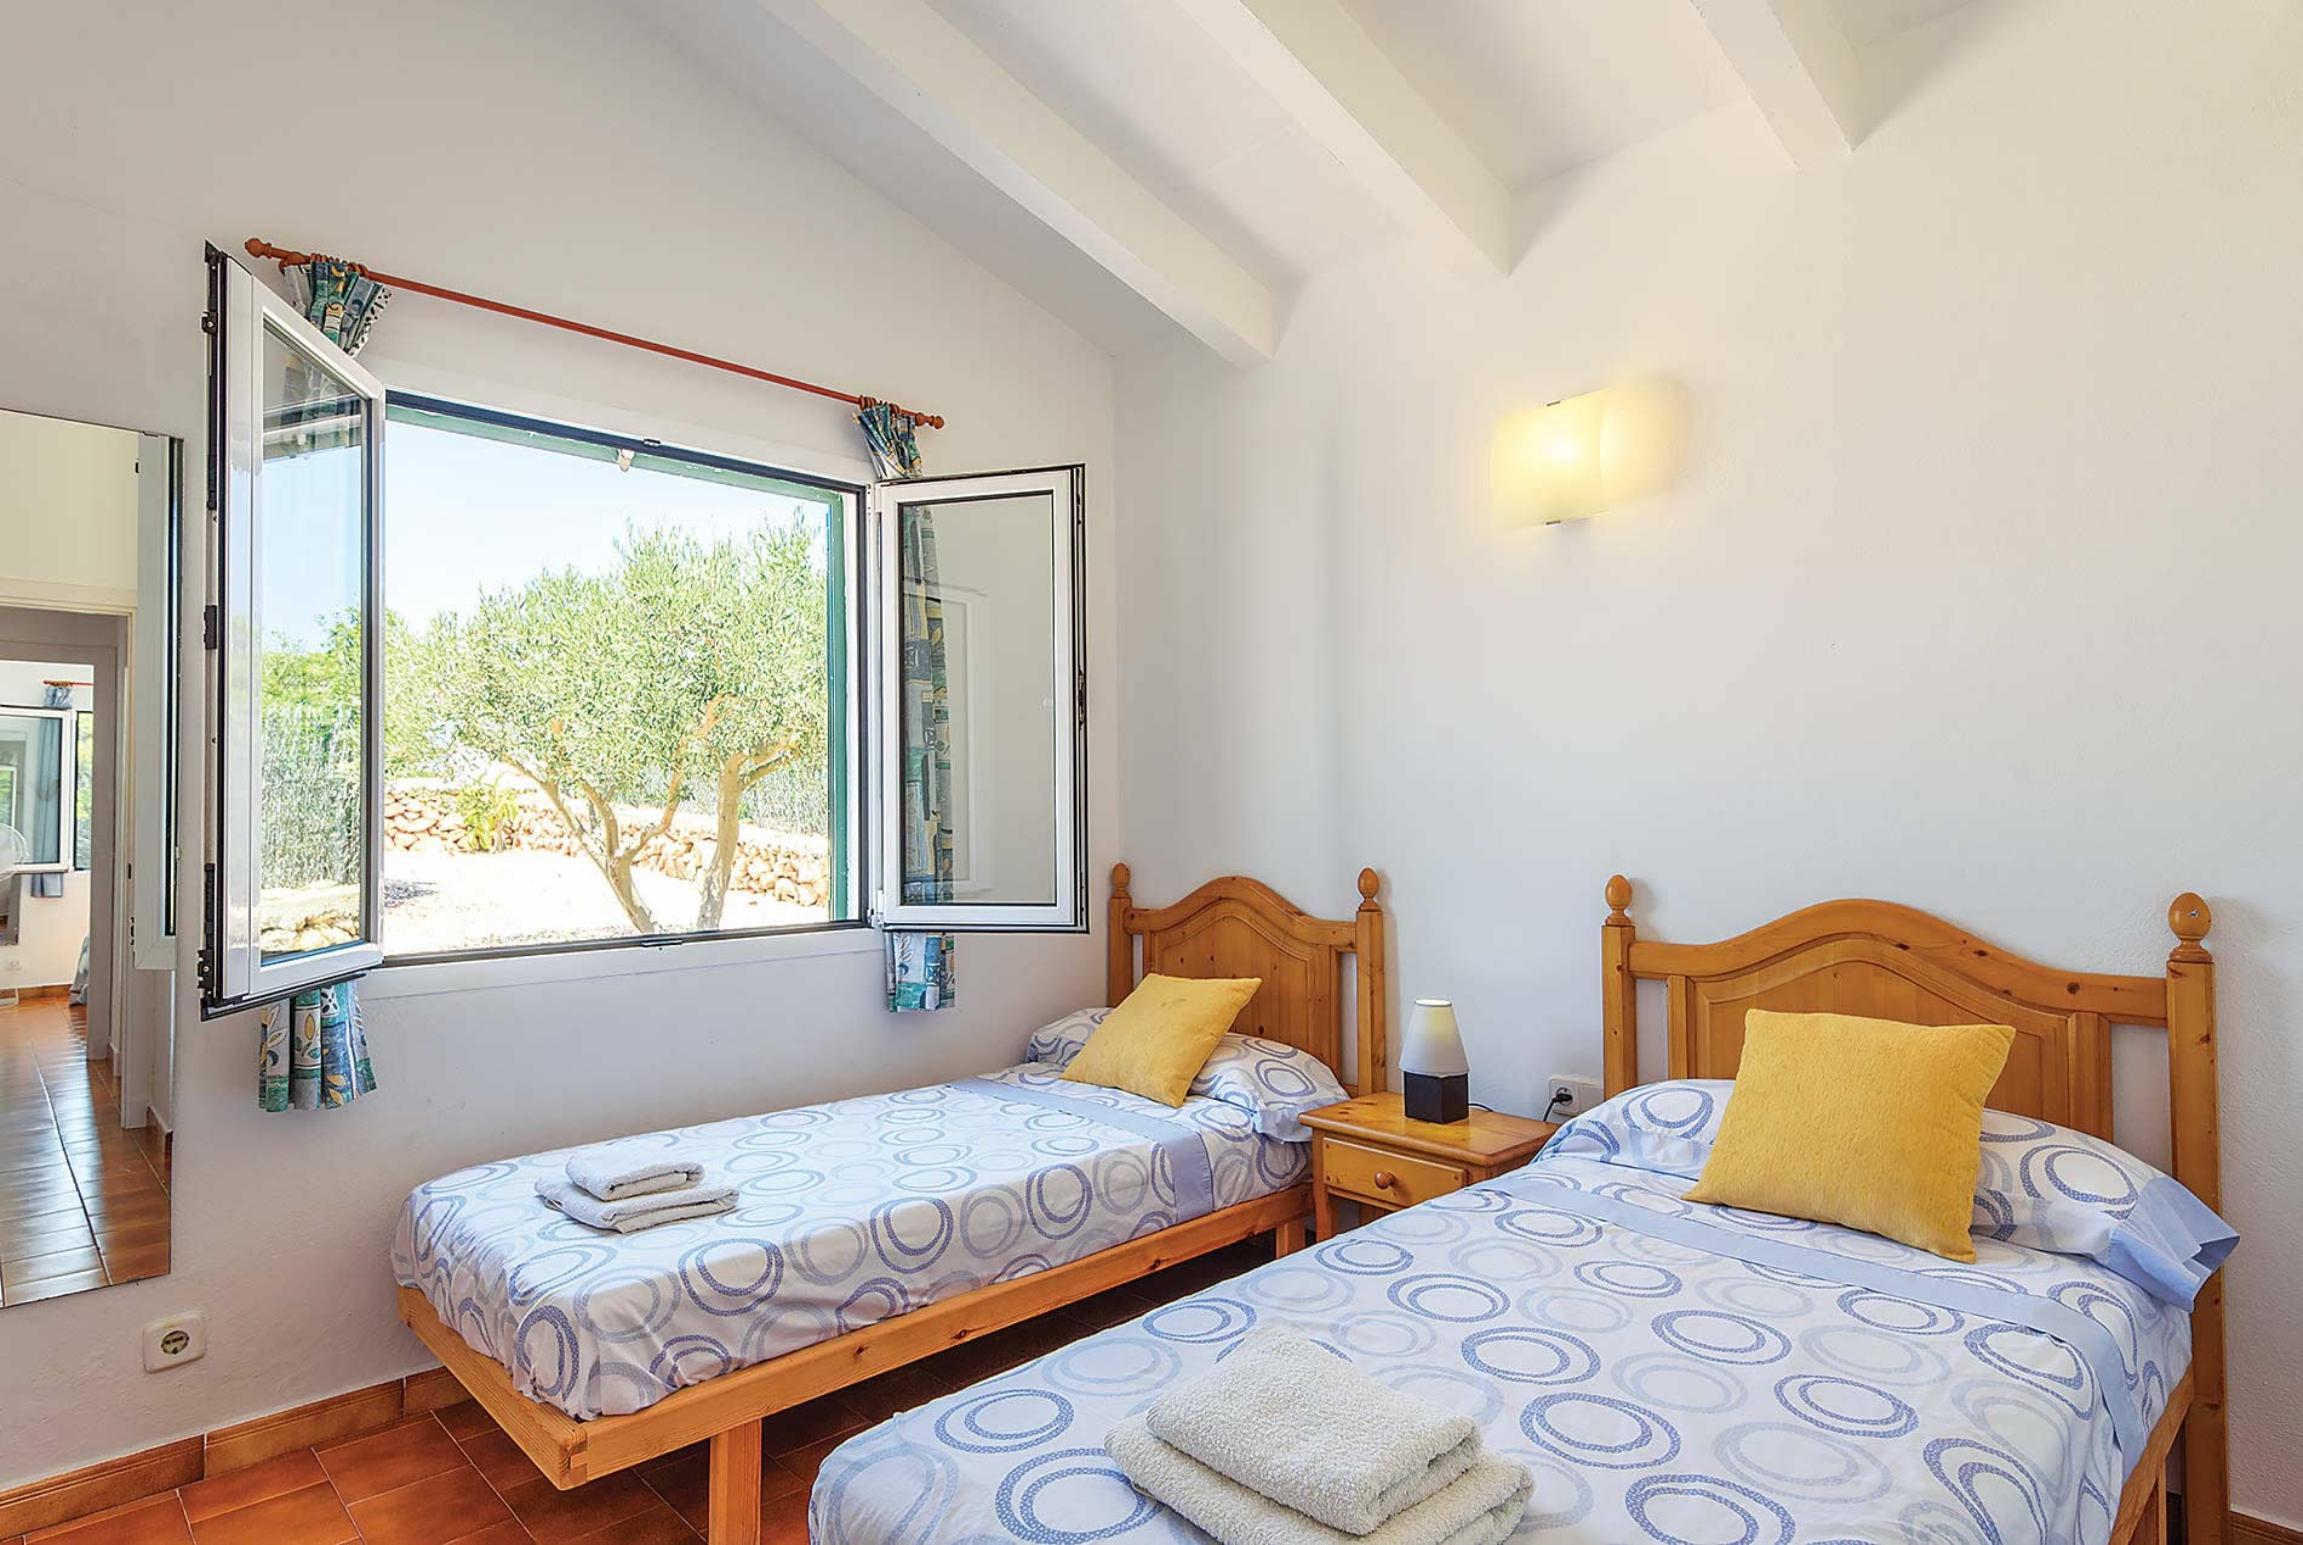 Ferienhaus Eulalia I (2653535), Arenal De'N Castell, Menorca, Balearische Inseln, Spanien, Bild 6